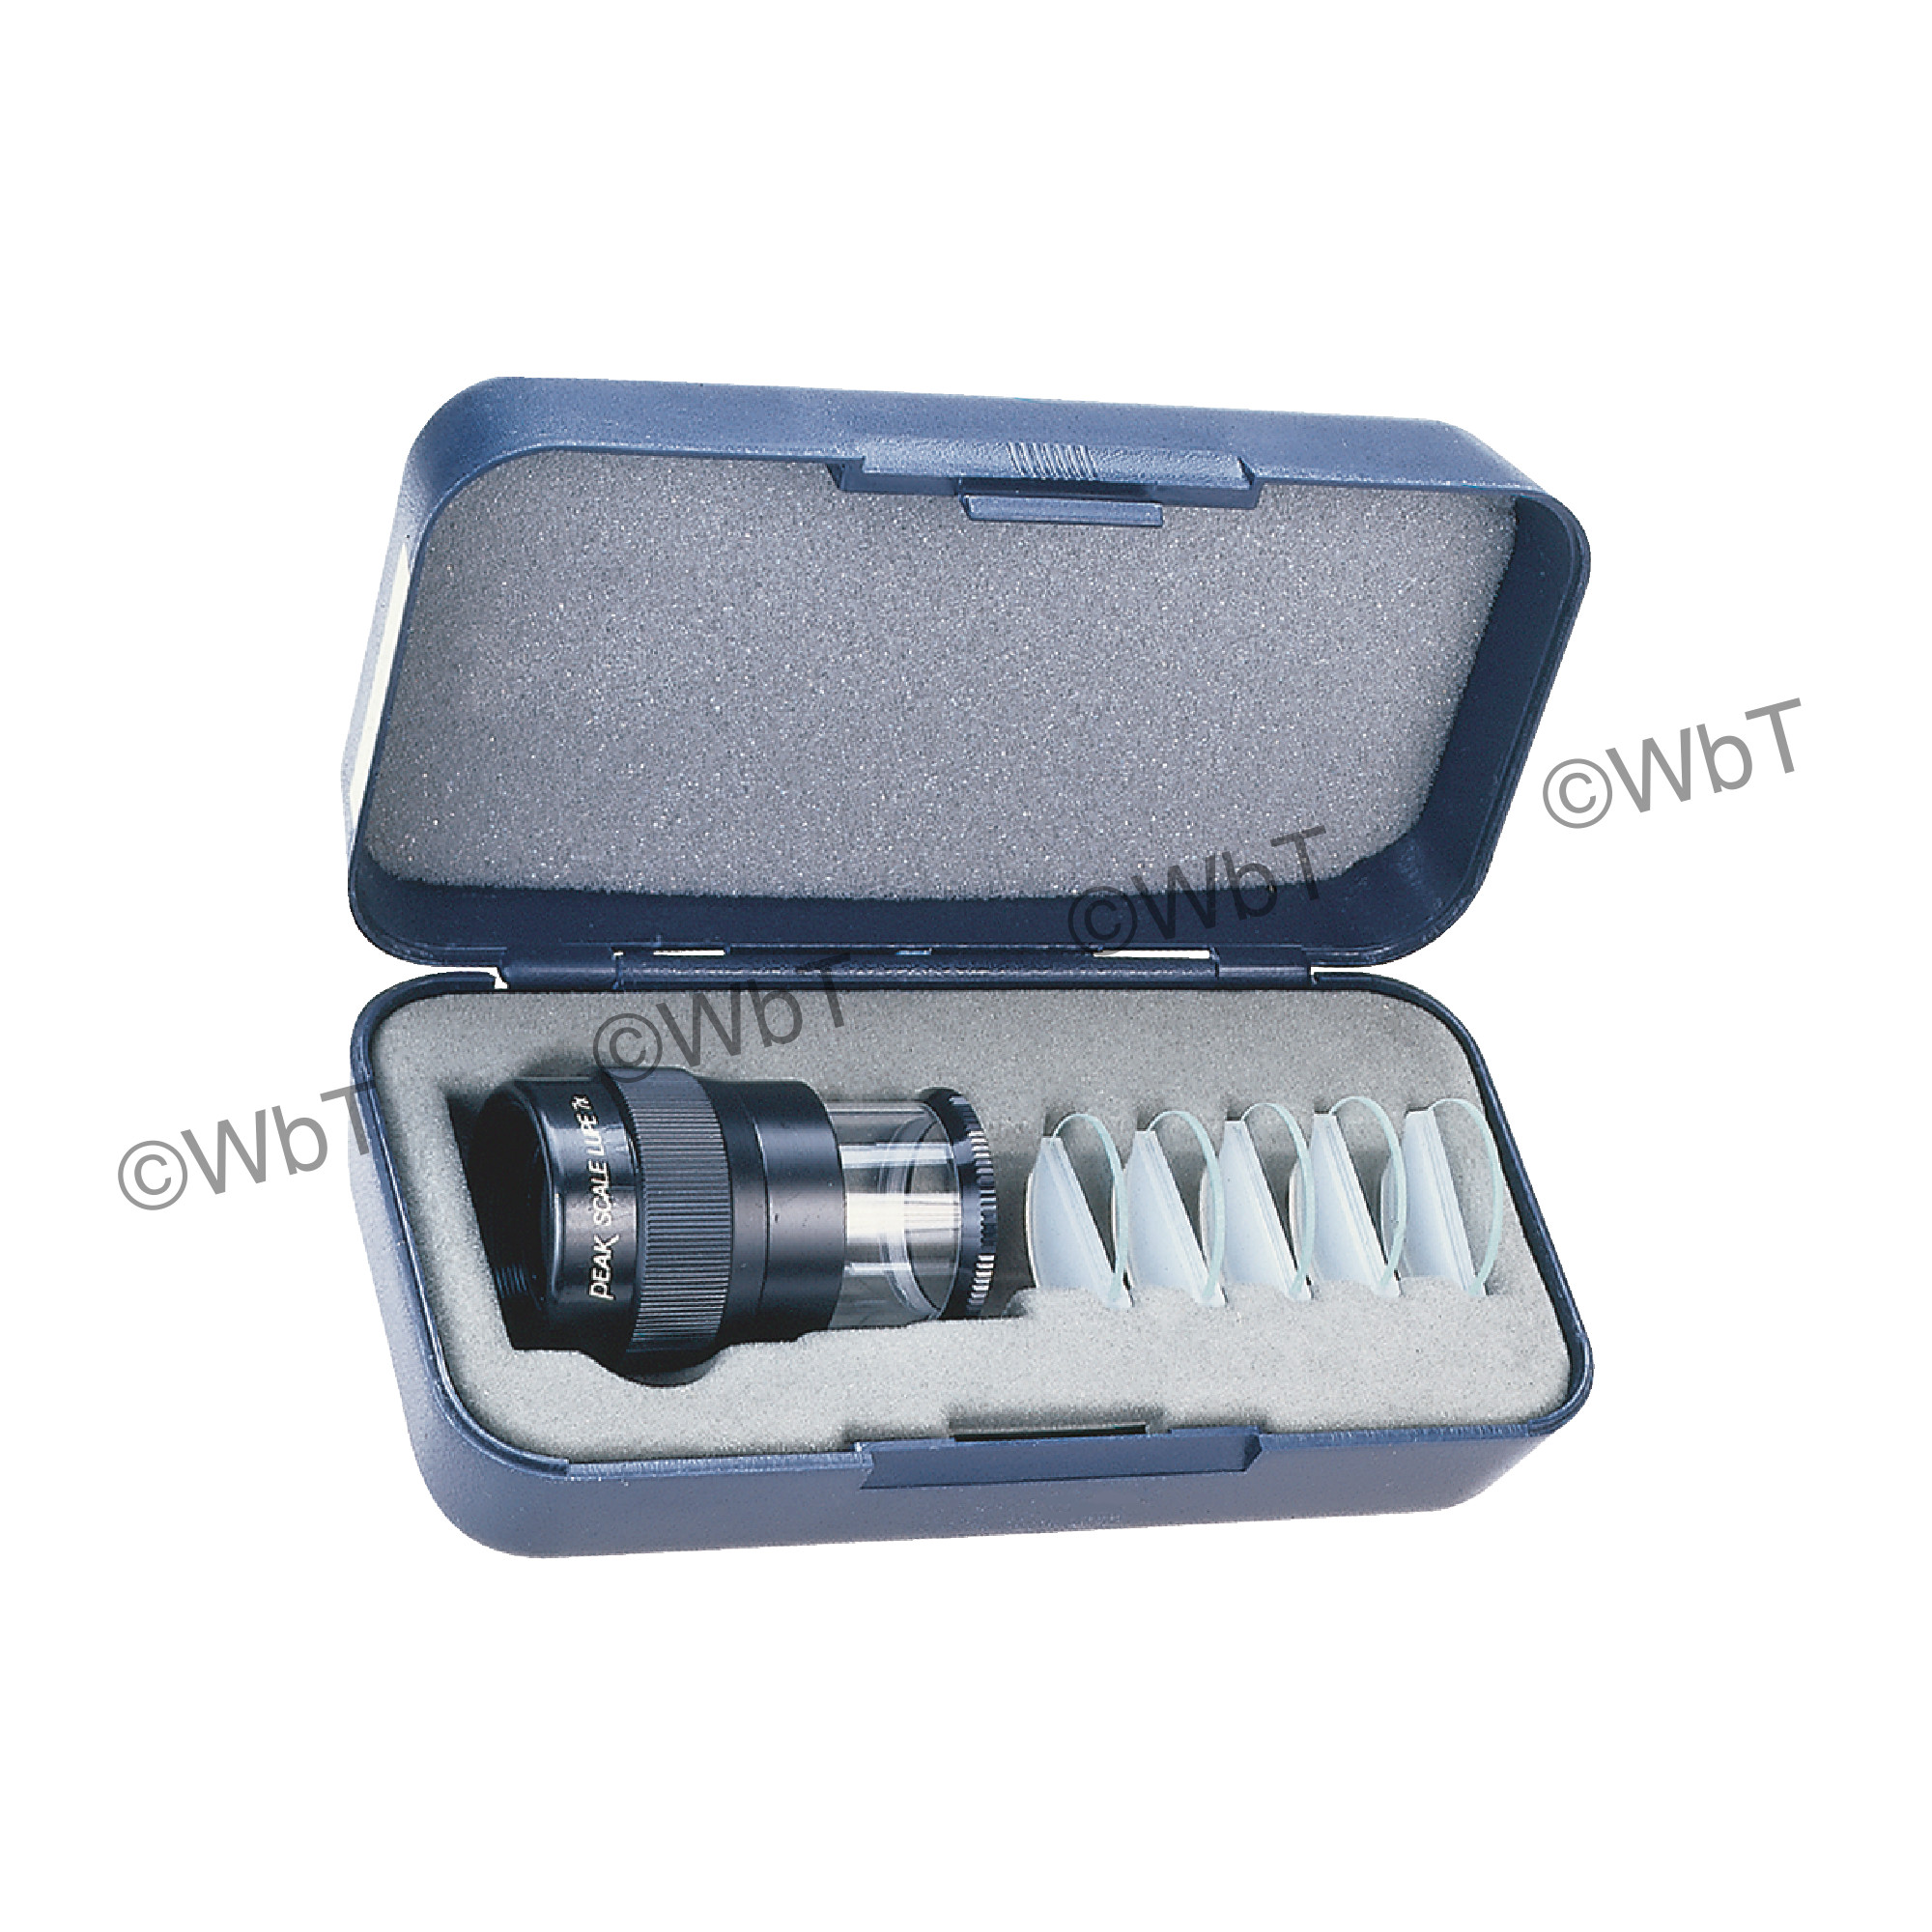 7X Optical Comparator Set